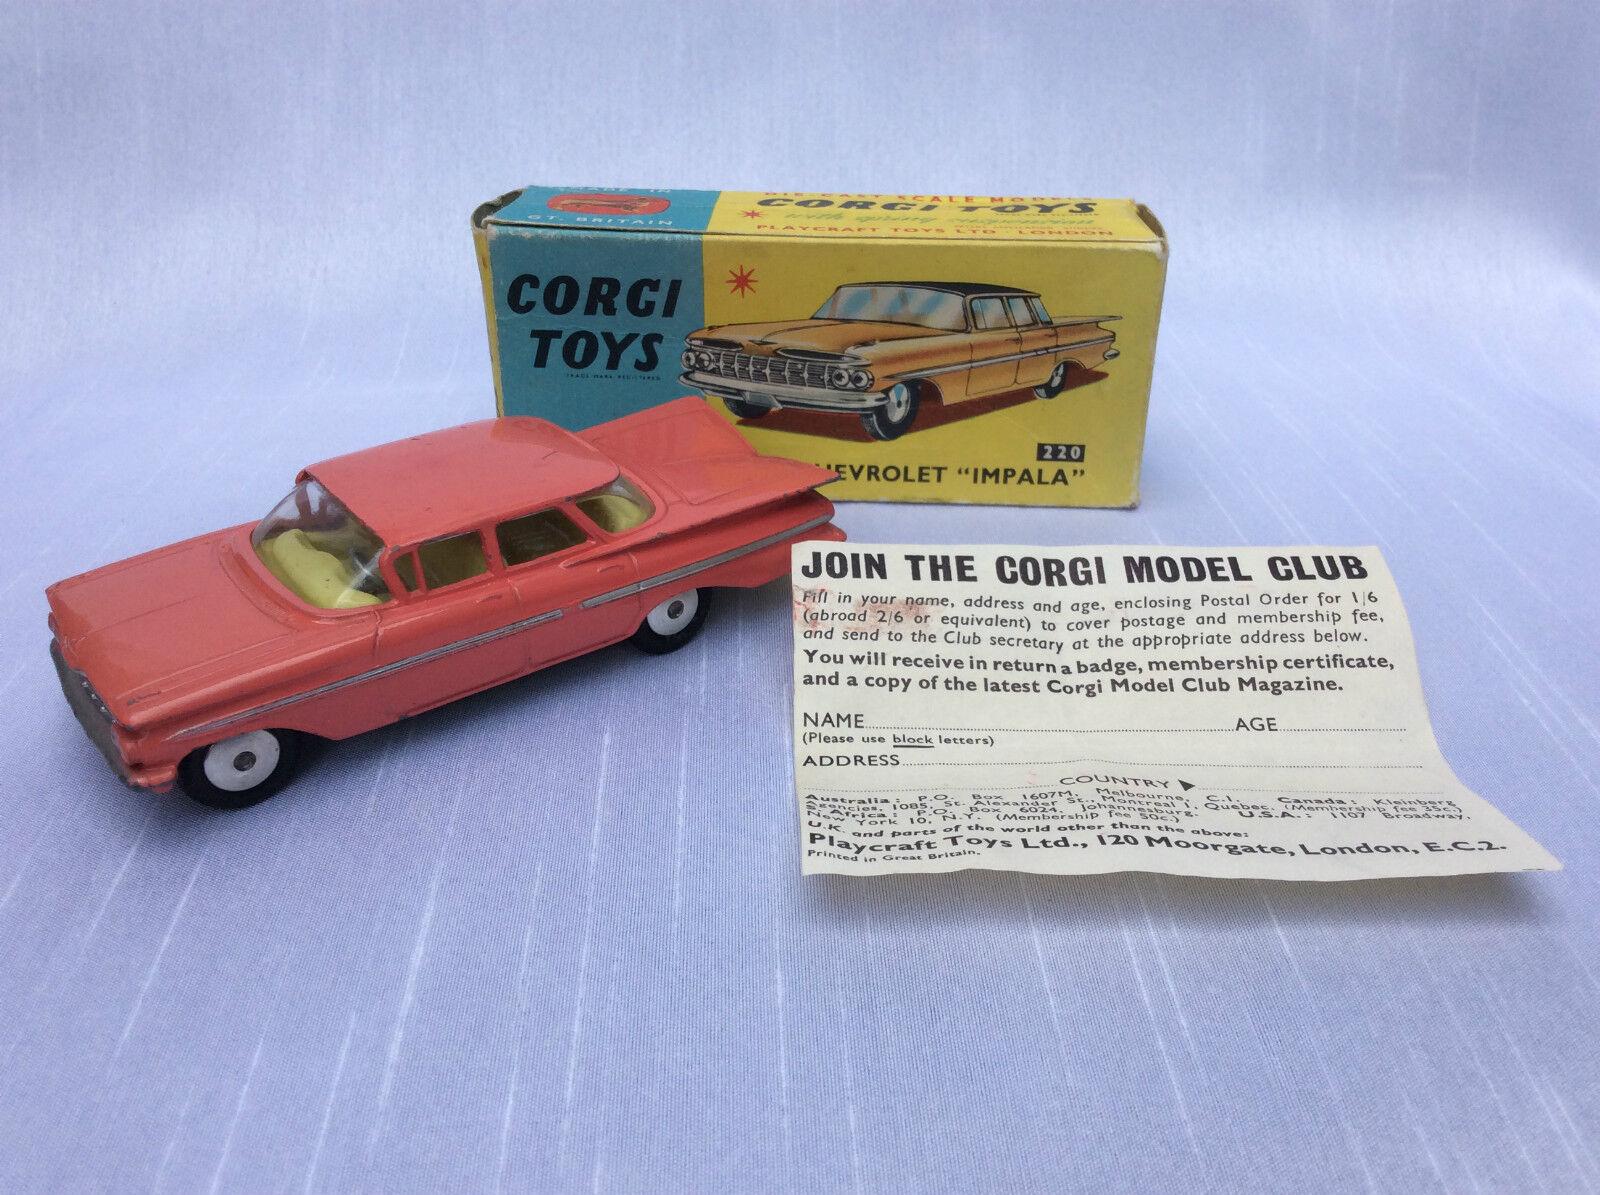 Corgi toys no. 220 Chevrolet Impala Pink ovp